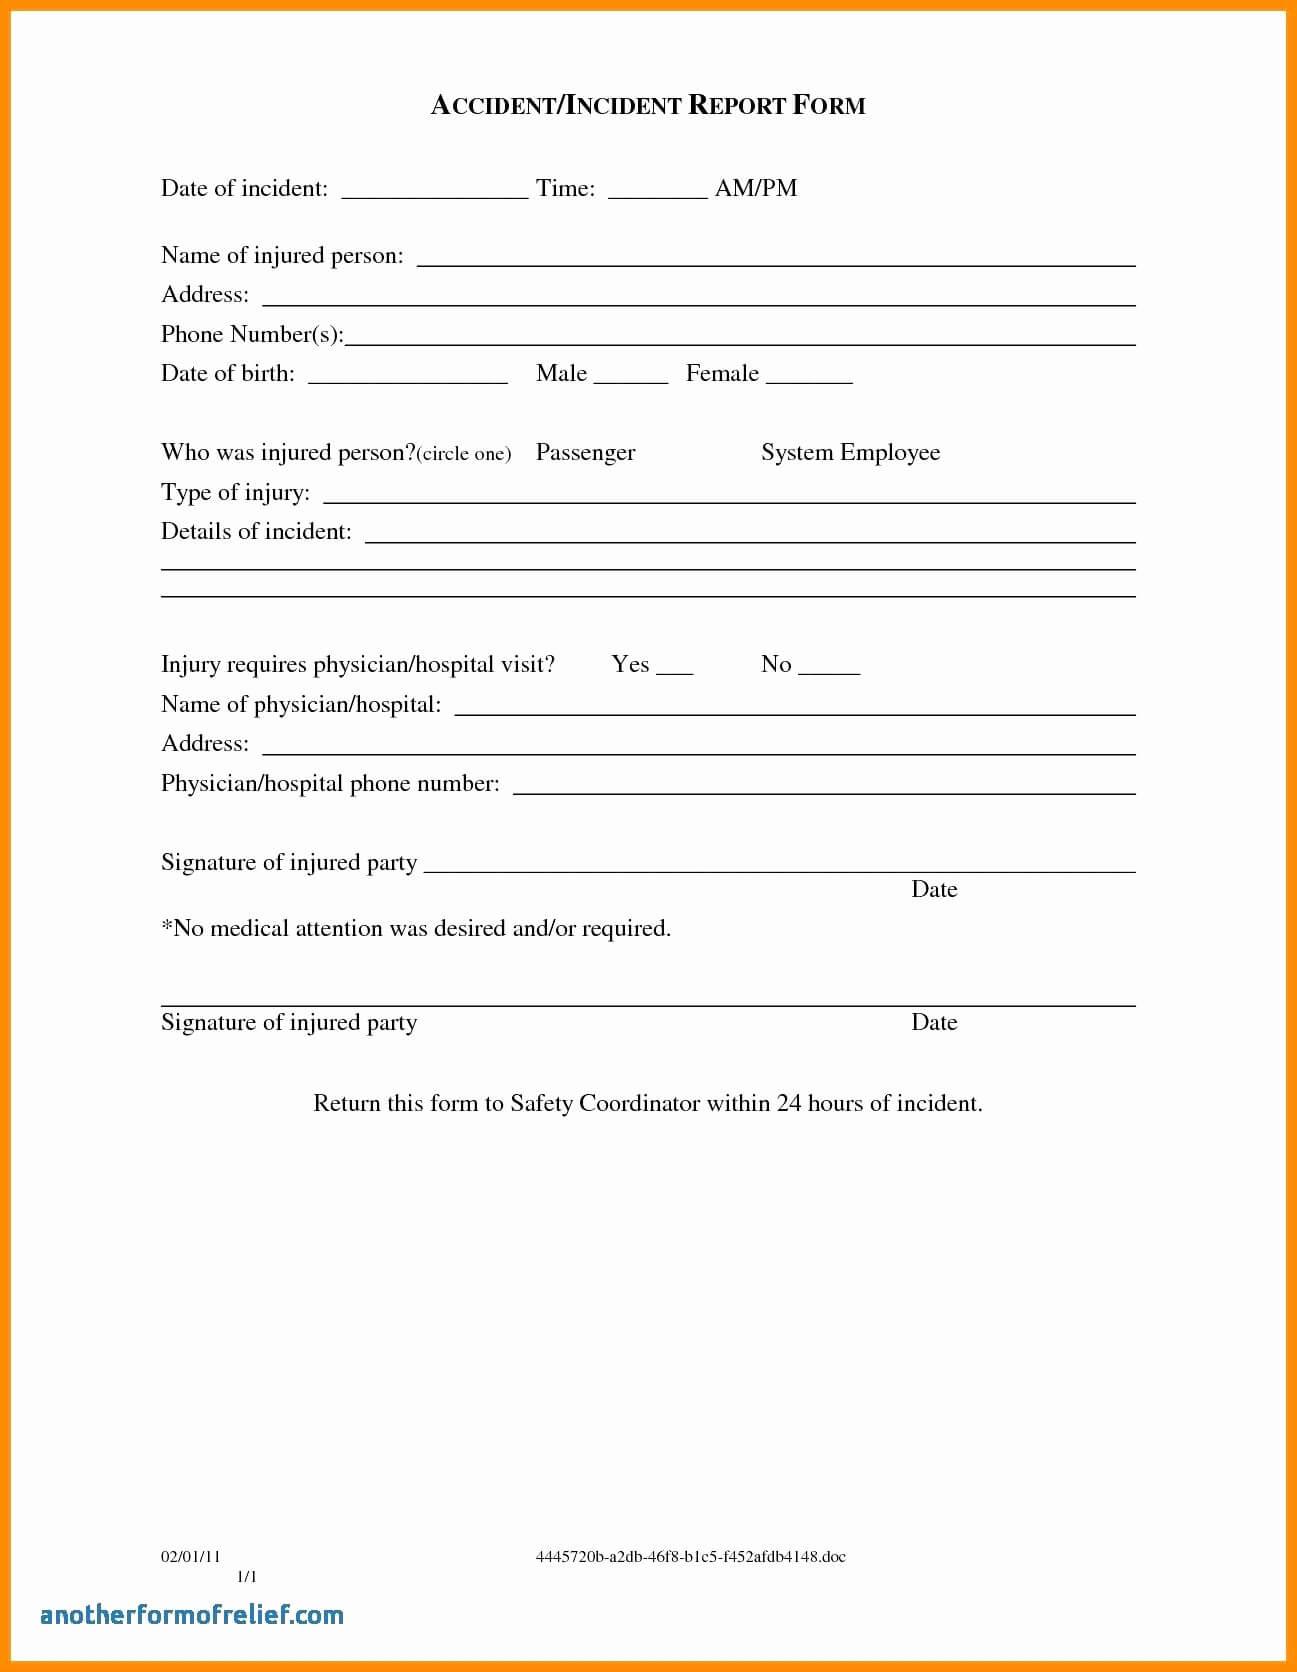 003 Template Ideas Incident Reportm Accidentms Hazard Inside Incident Hazard Report Form Template